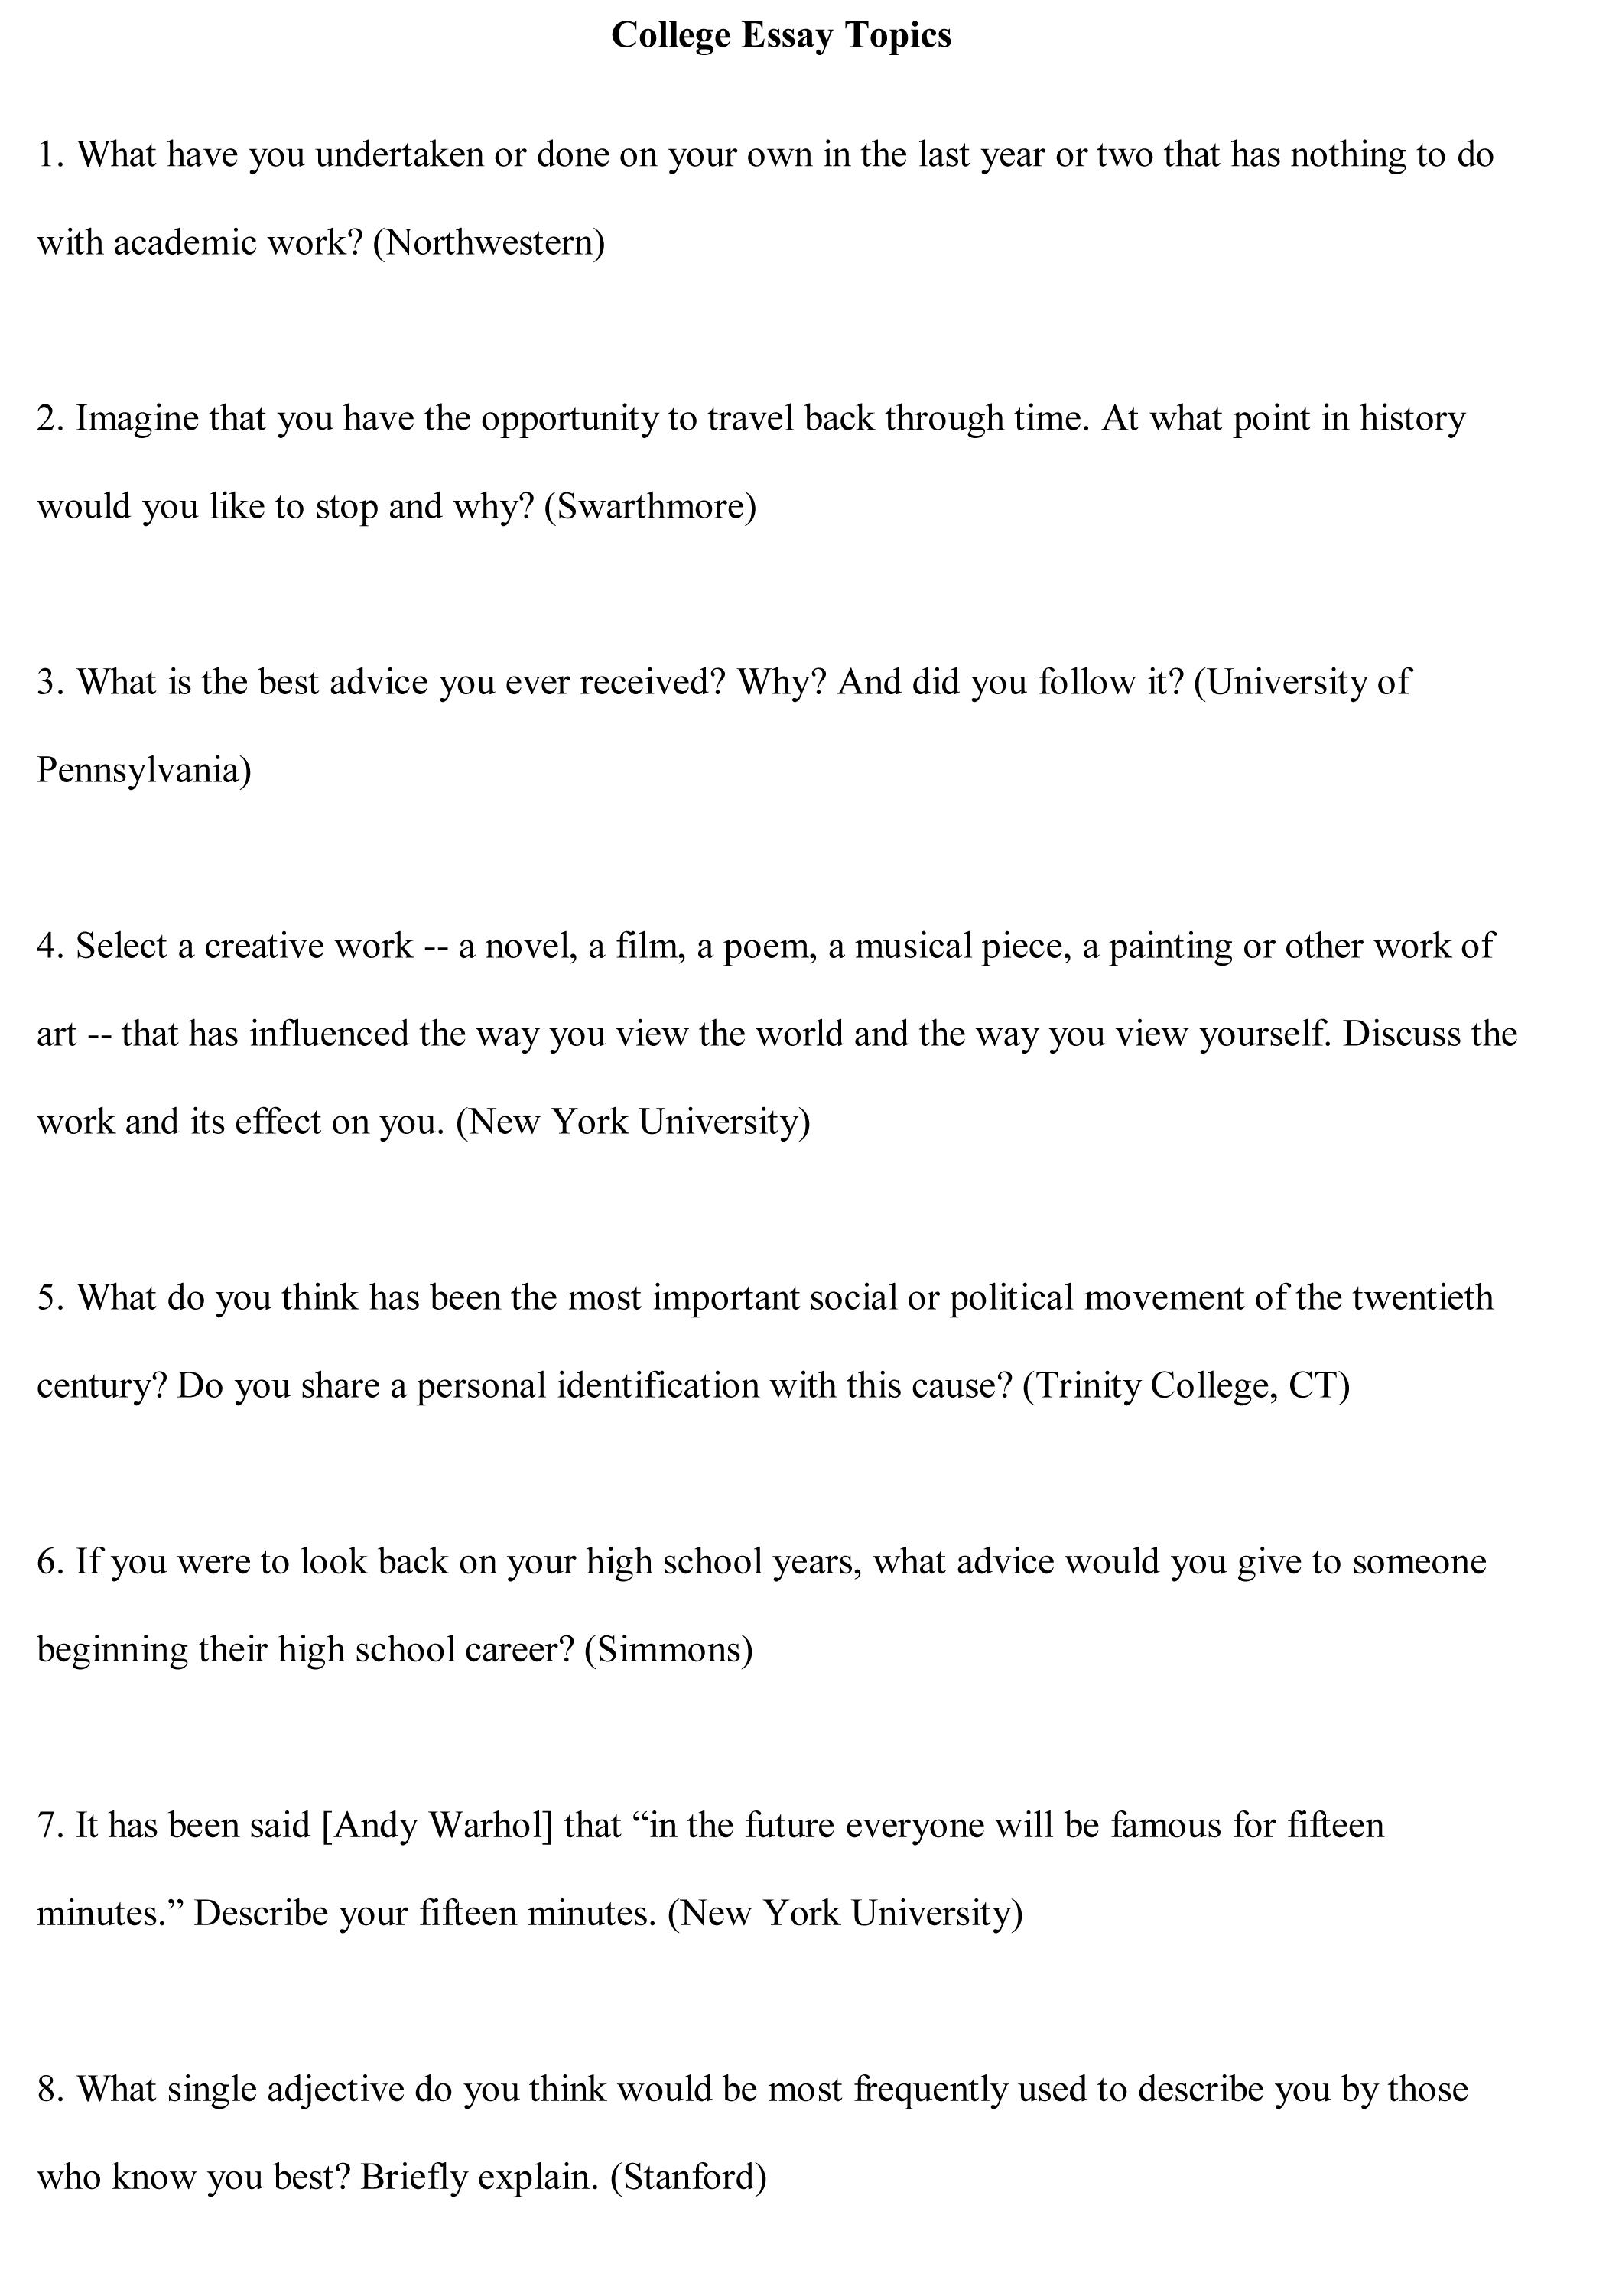 009 Essay Example Ideas For Narrative College Topics Free Beautiful A Fictional Writing Personal Descriptive Full